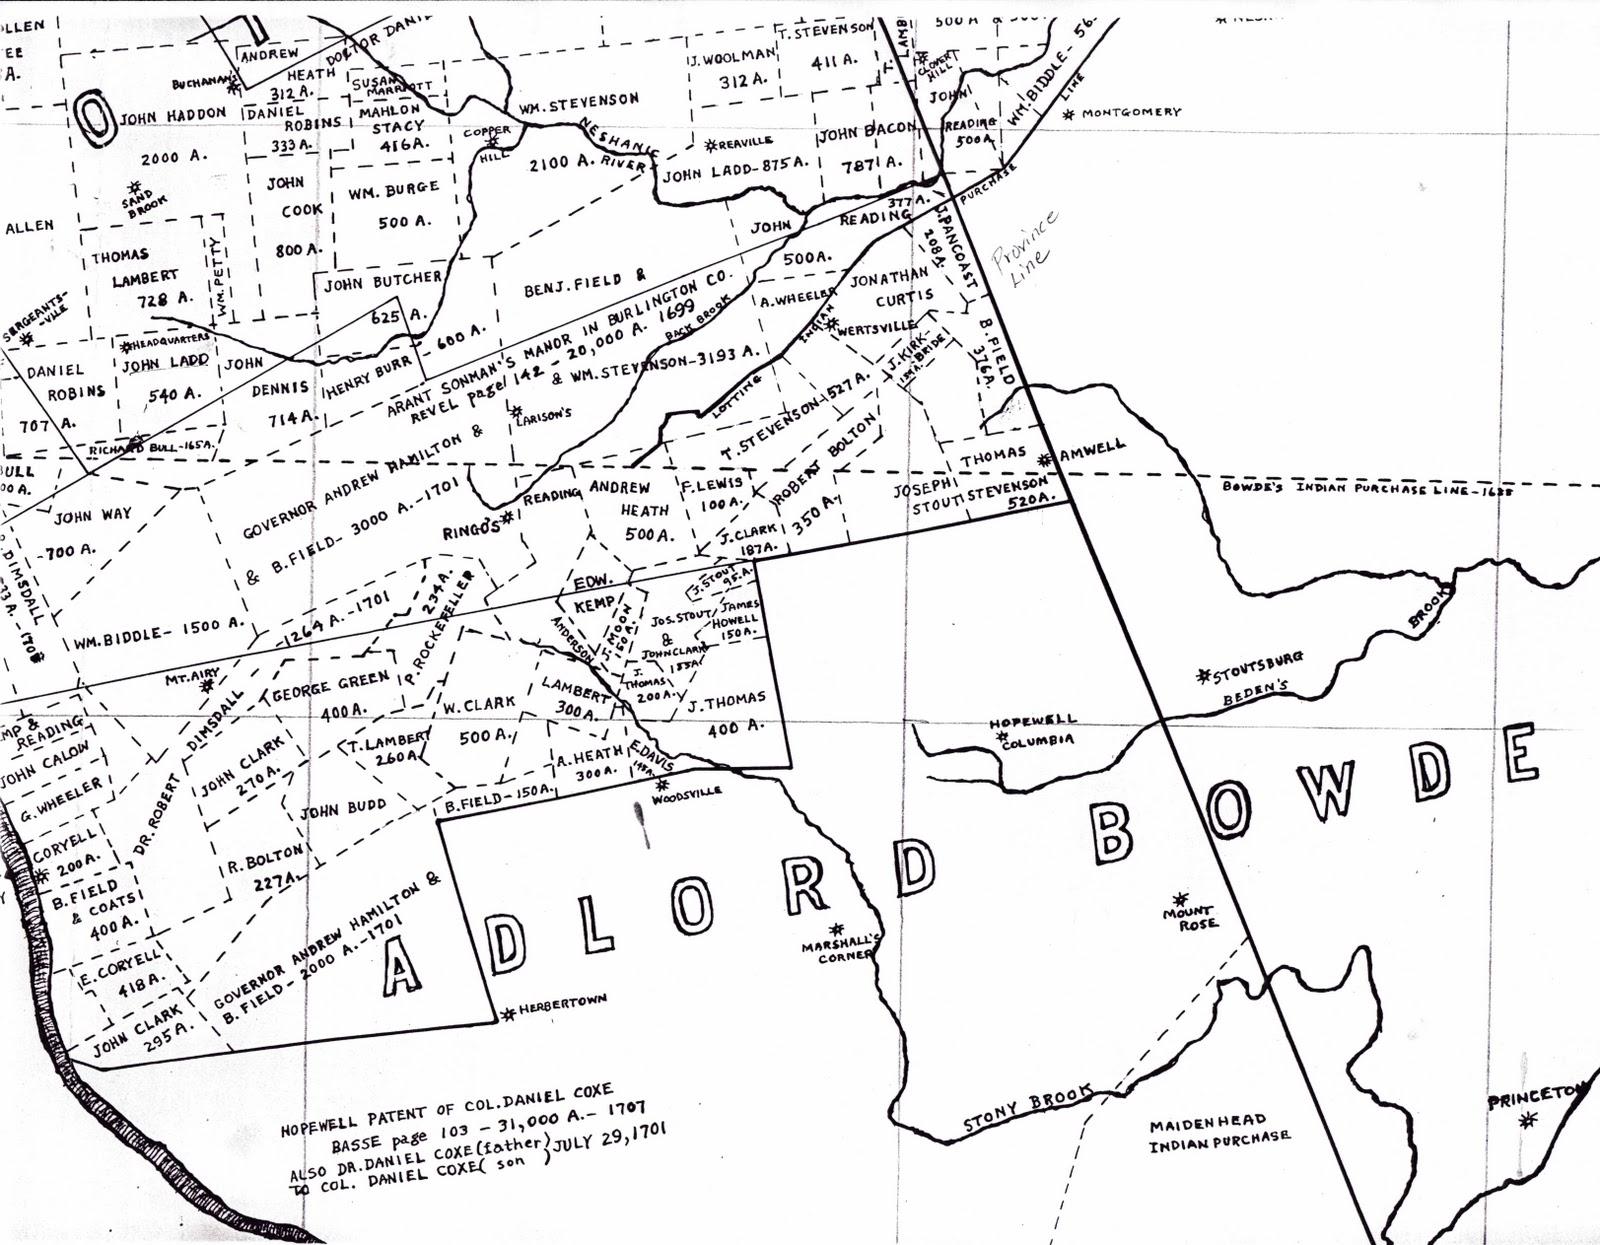 West Nj And Daniel Coxe Part 1 Goodspeed Histories